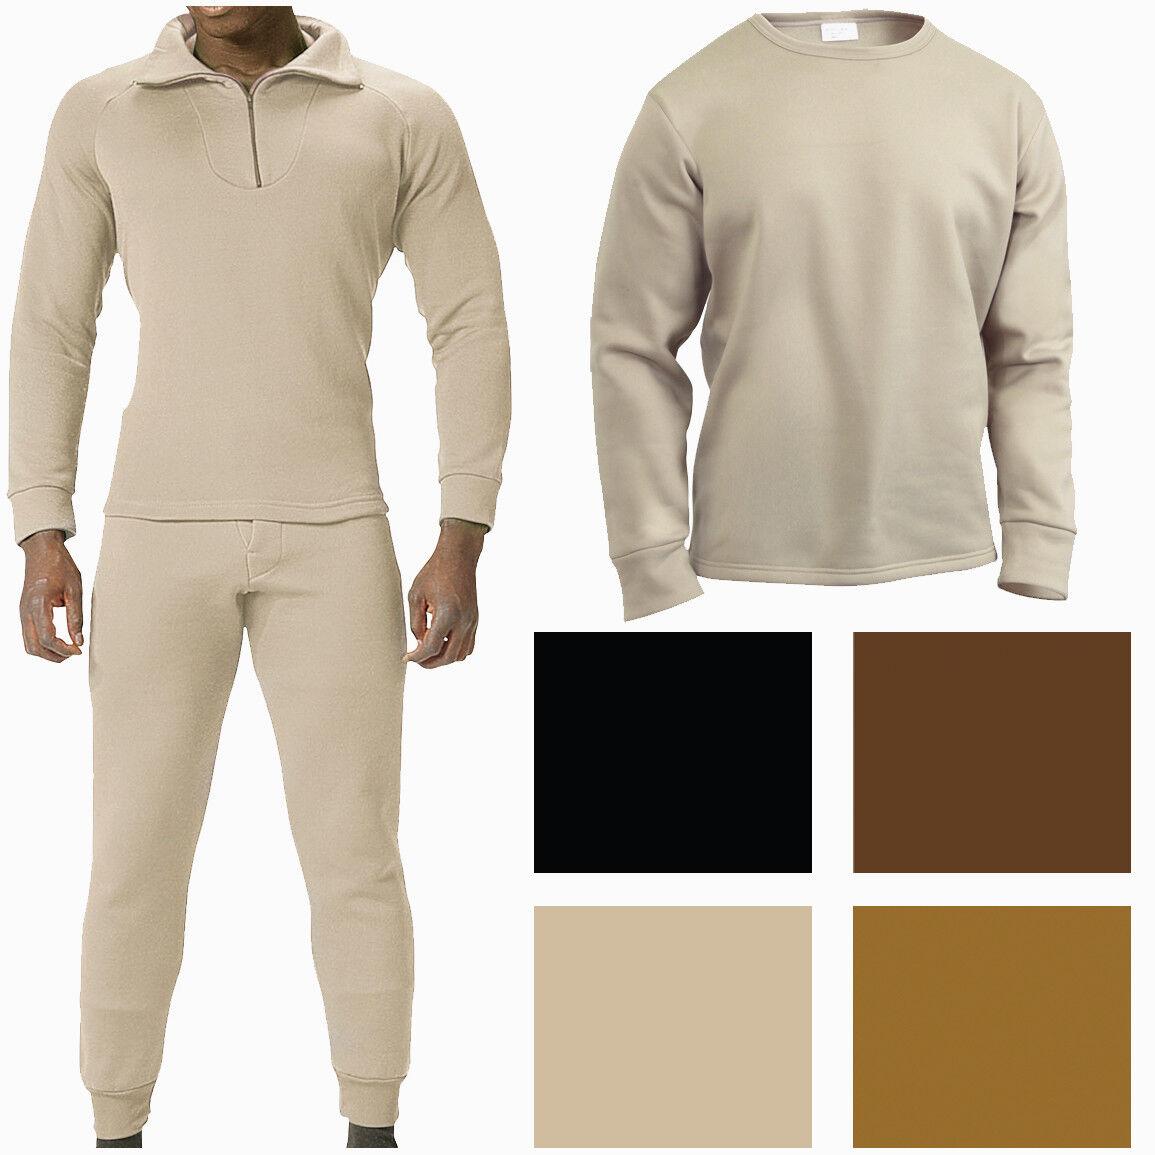 Купить ECWCS Military Fleece Thermals Extra Warm Winter Underwear Long Johns Base Layer